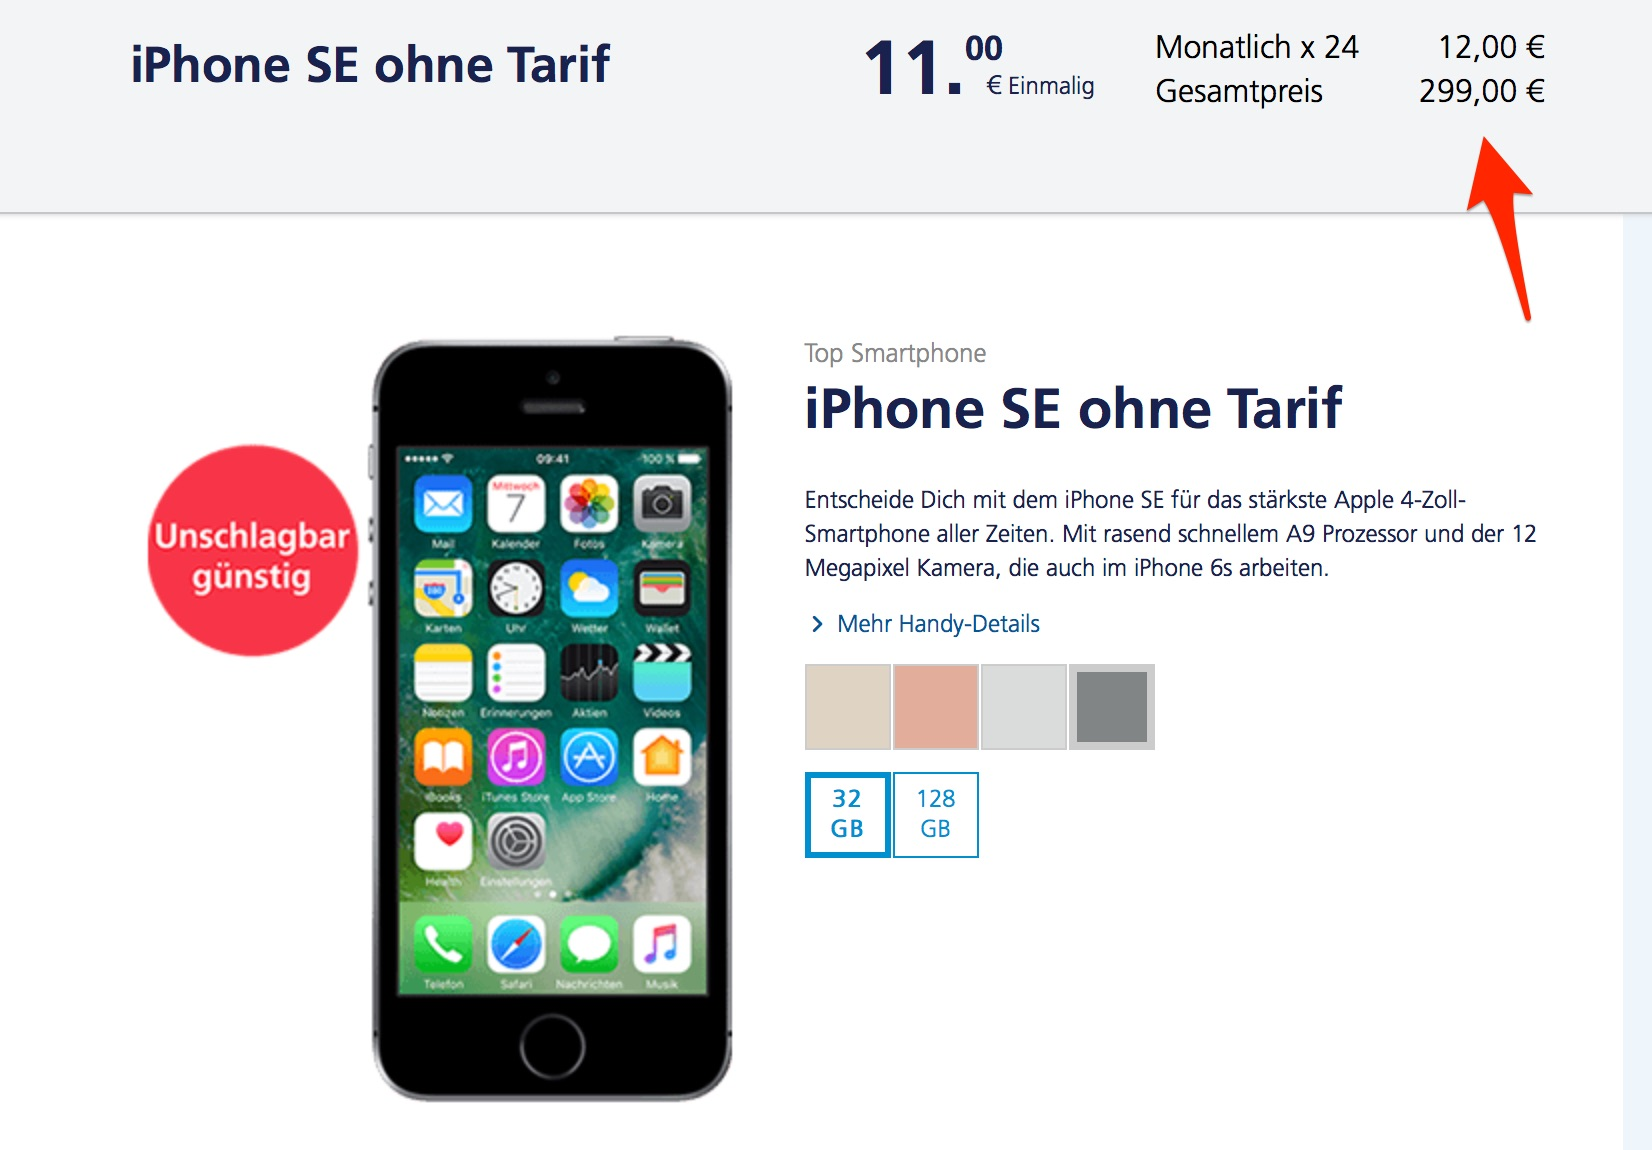 Iphone Se 32gb Bei O2 Nur 299 Euro Macerkopf